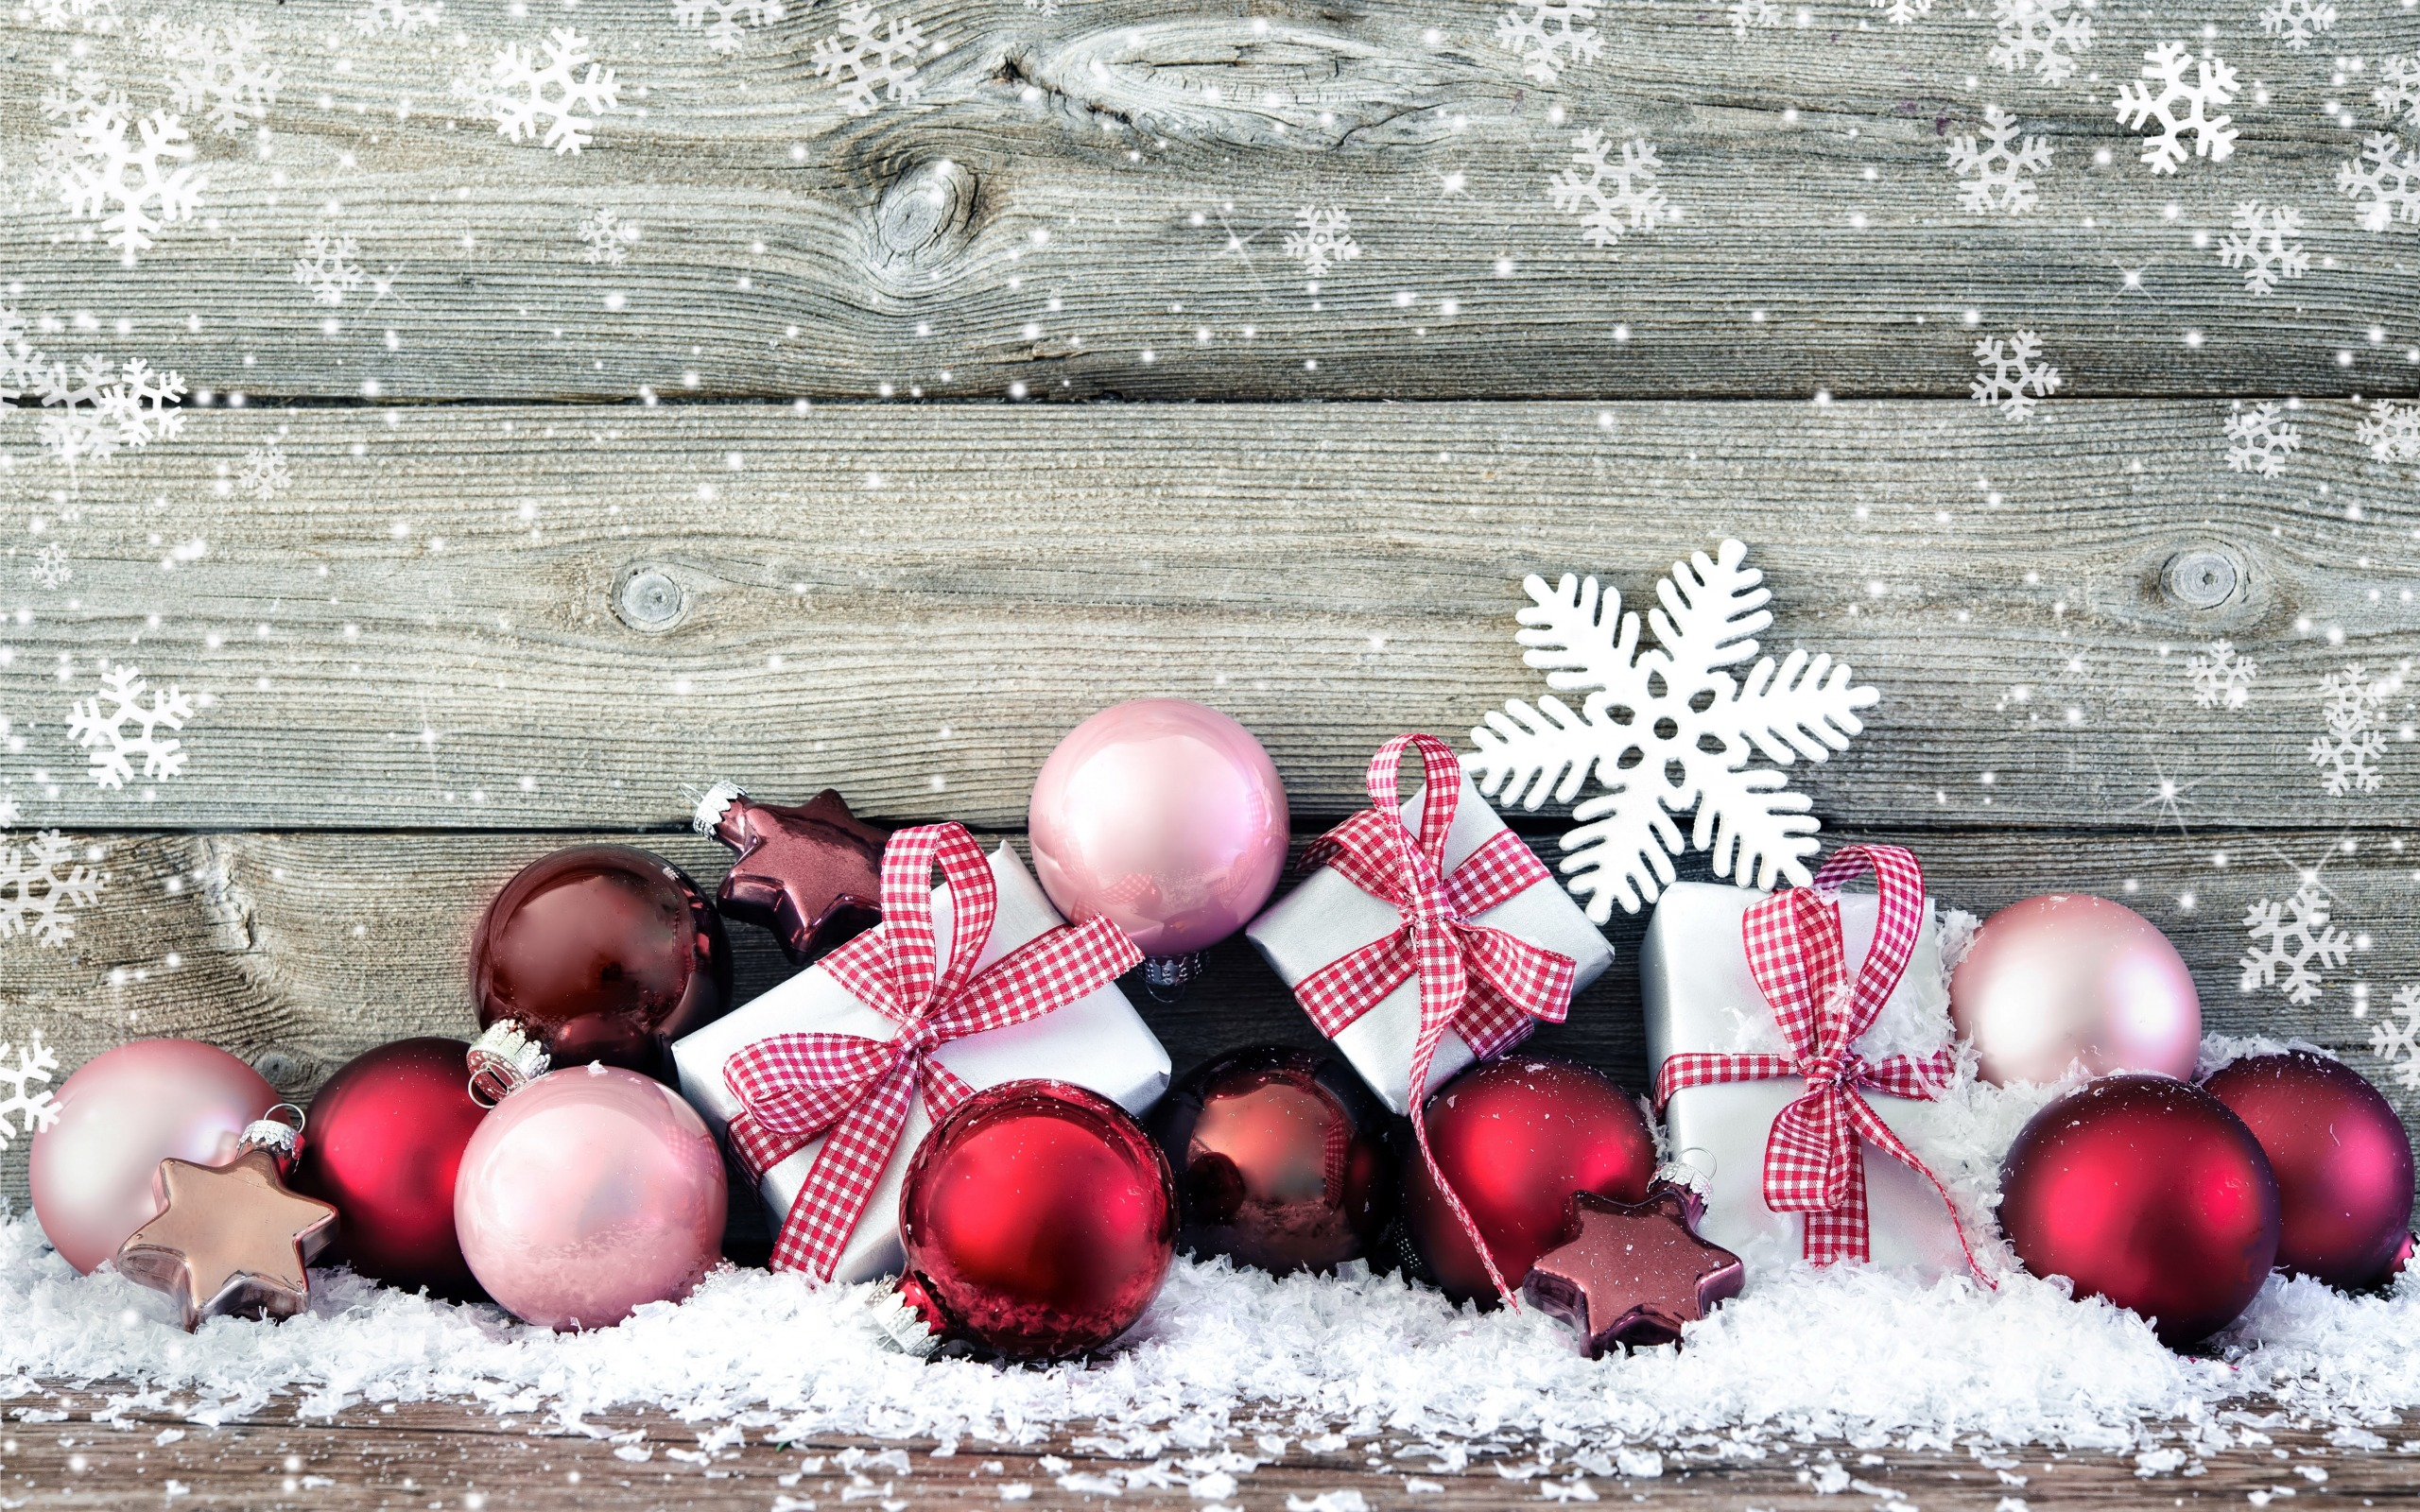 Red Christmas Decorations Wooden Wall Snow Desktop Wallpaper 2560x1600